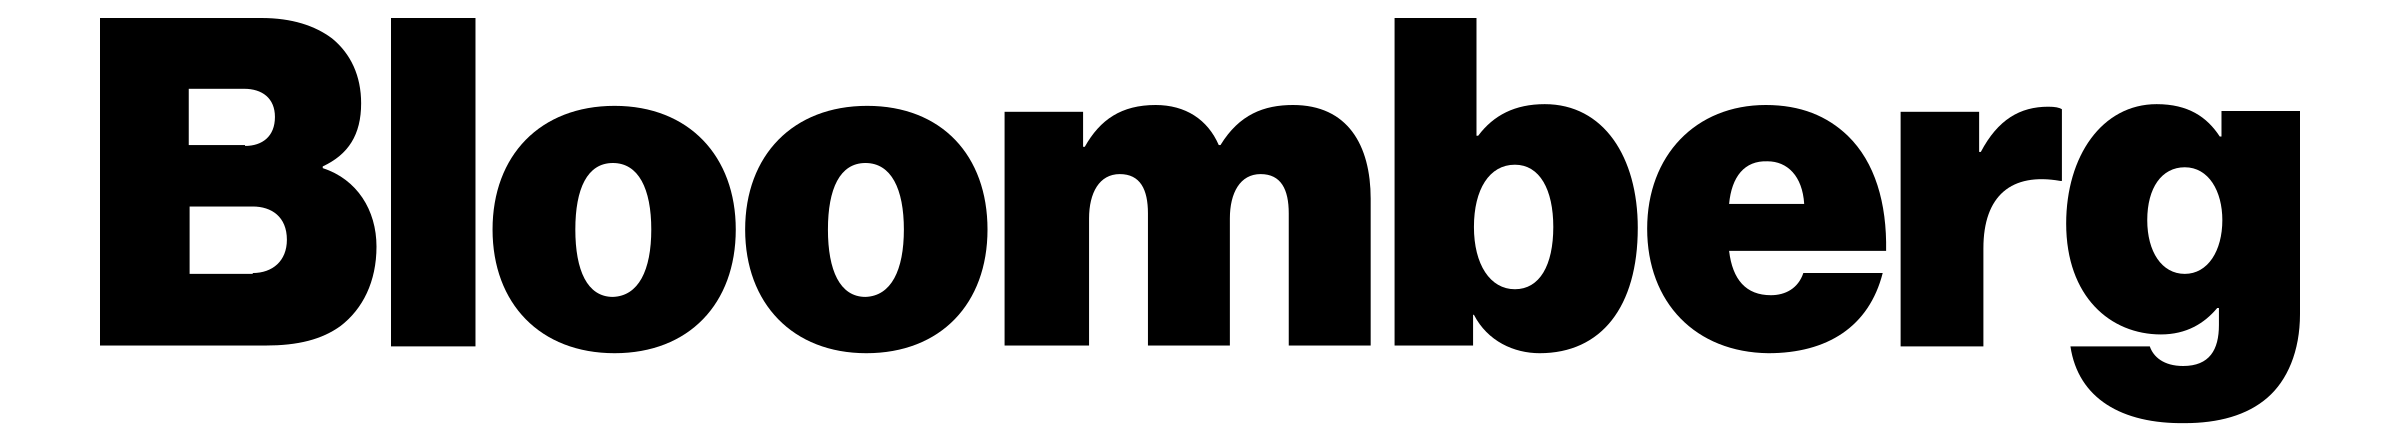 MILTZEN-T READY READER | Timeless Round Glasses | MOSCOT